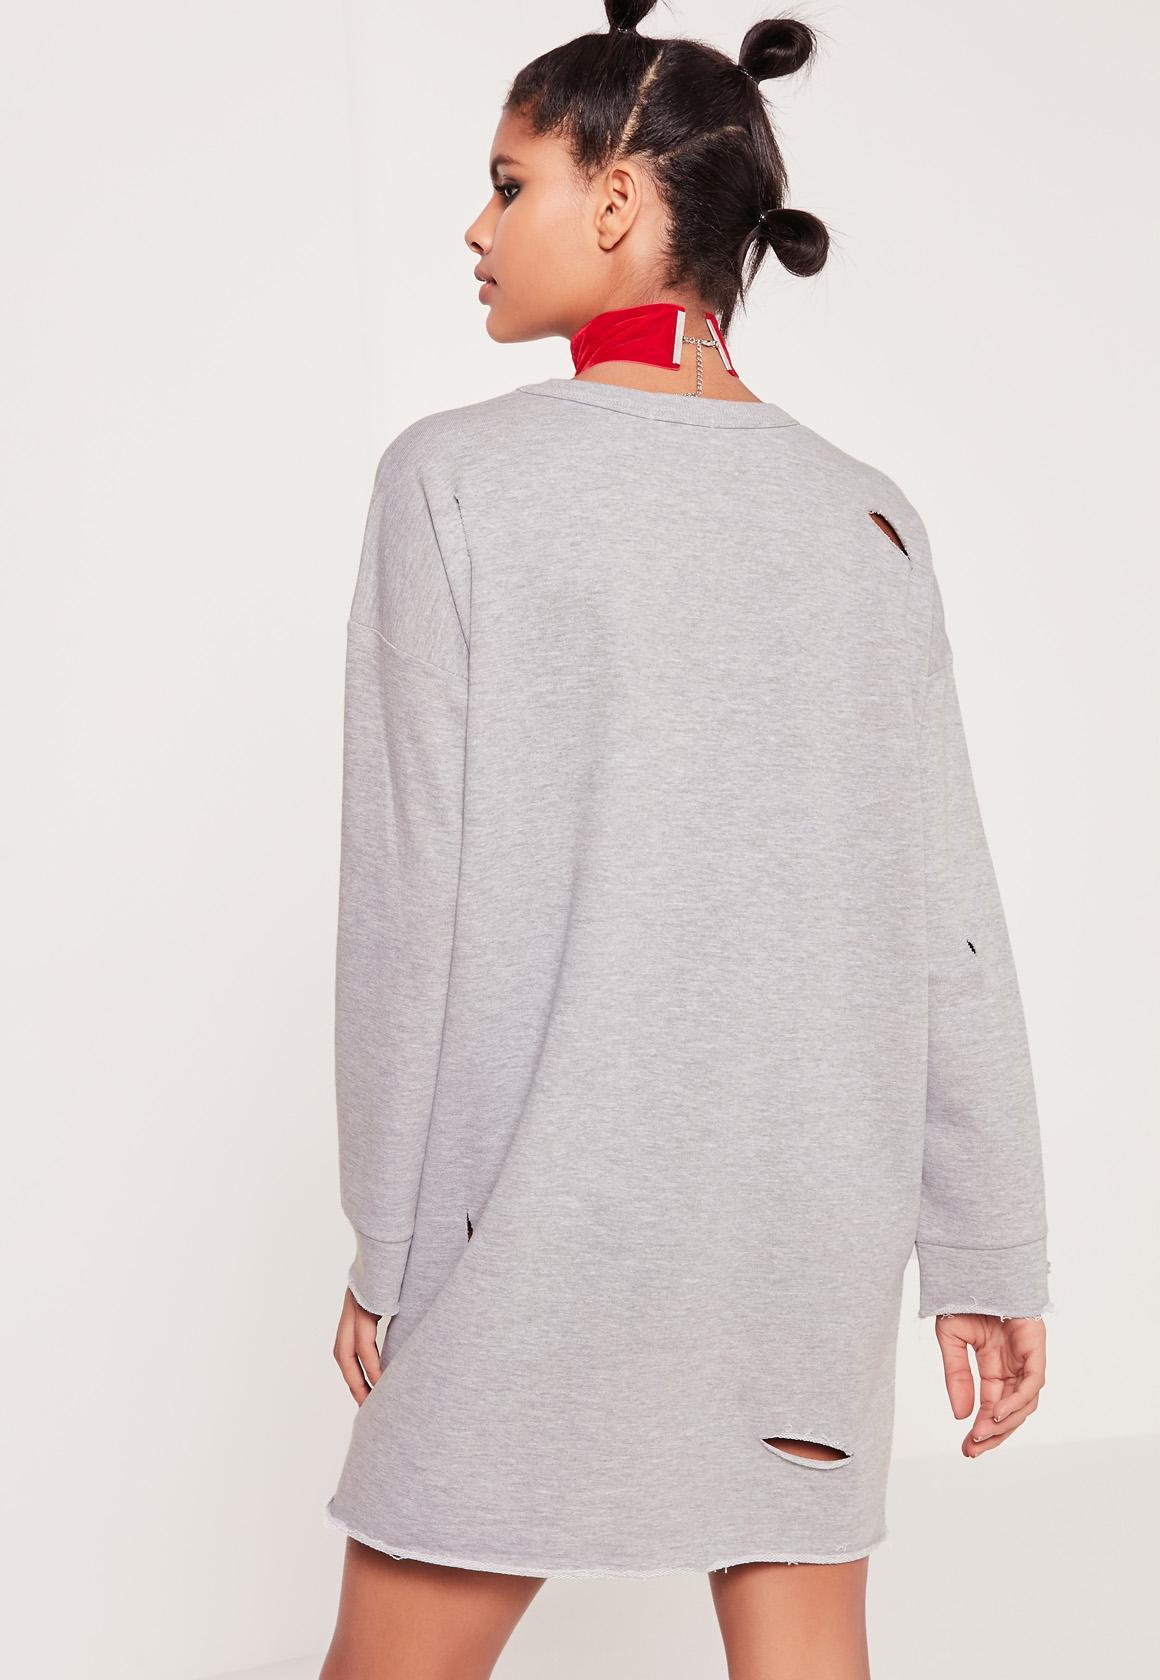 Grey Ripped Tokyo Oversized Sweater Dress [ZDC_469548] - $23.99 : Shop